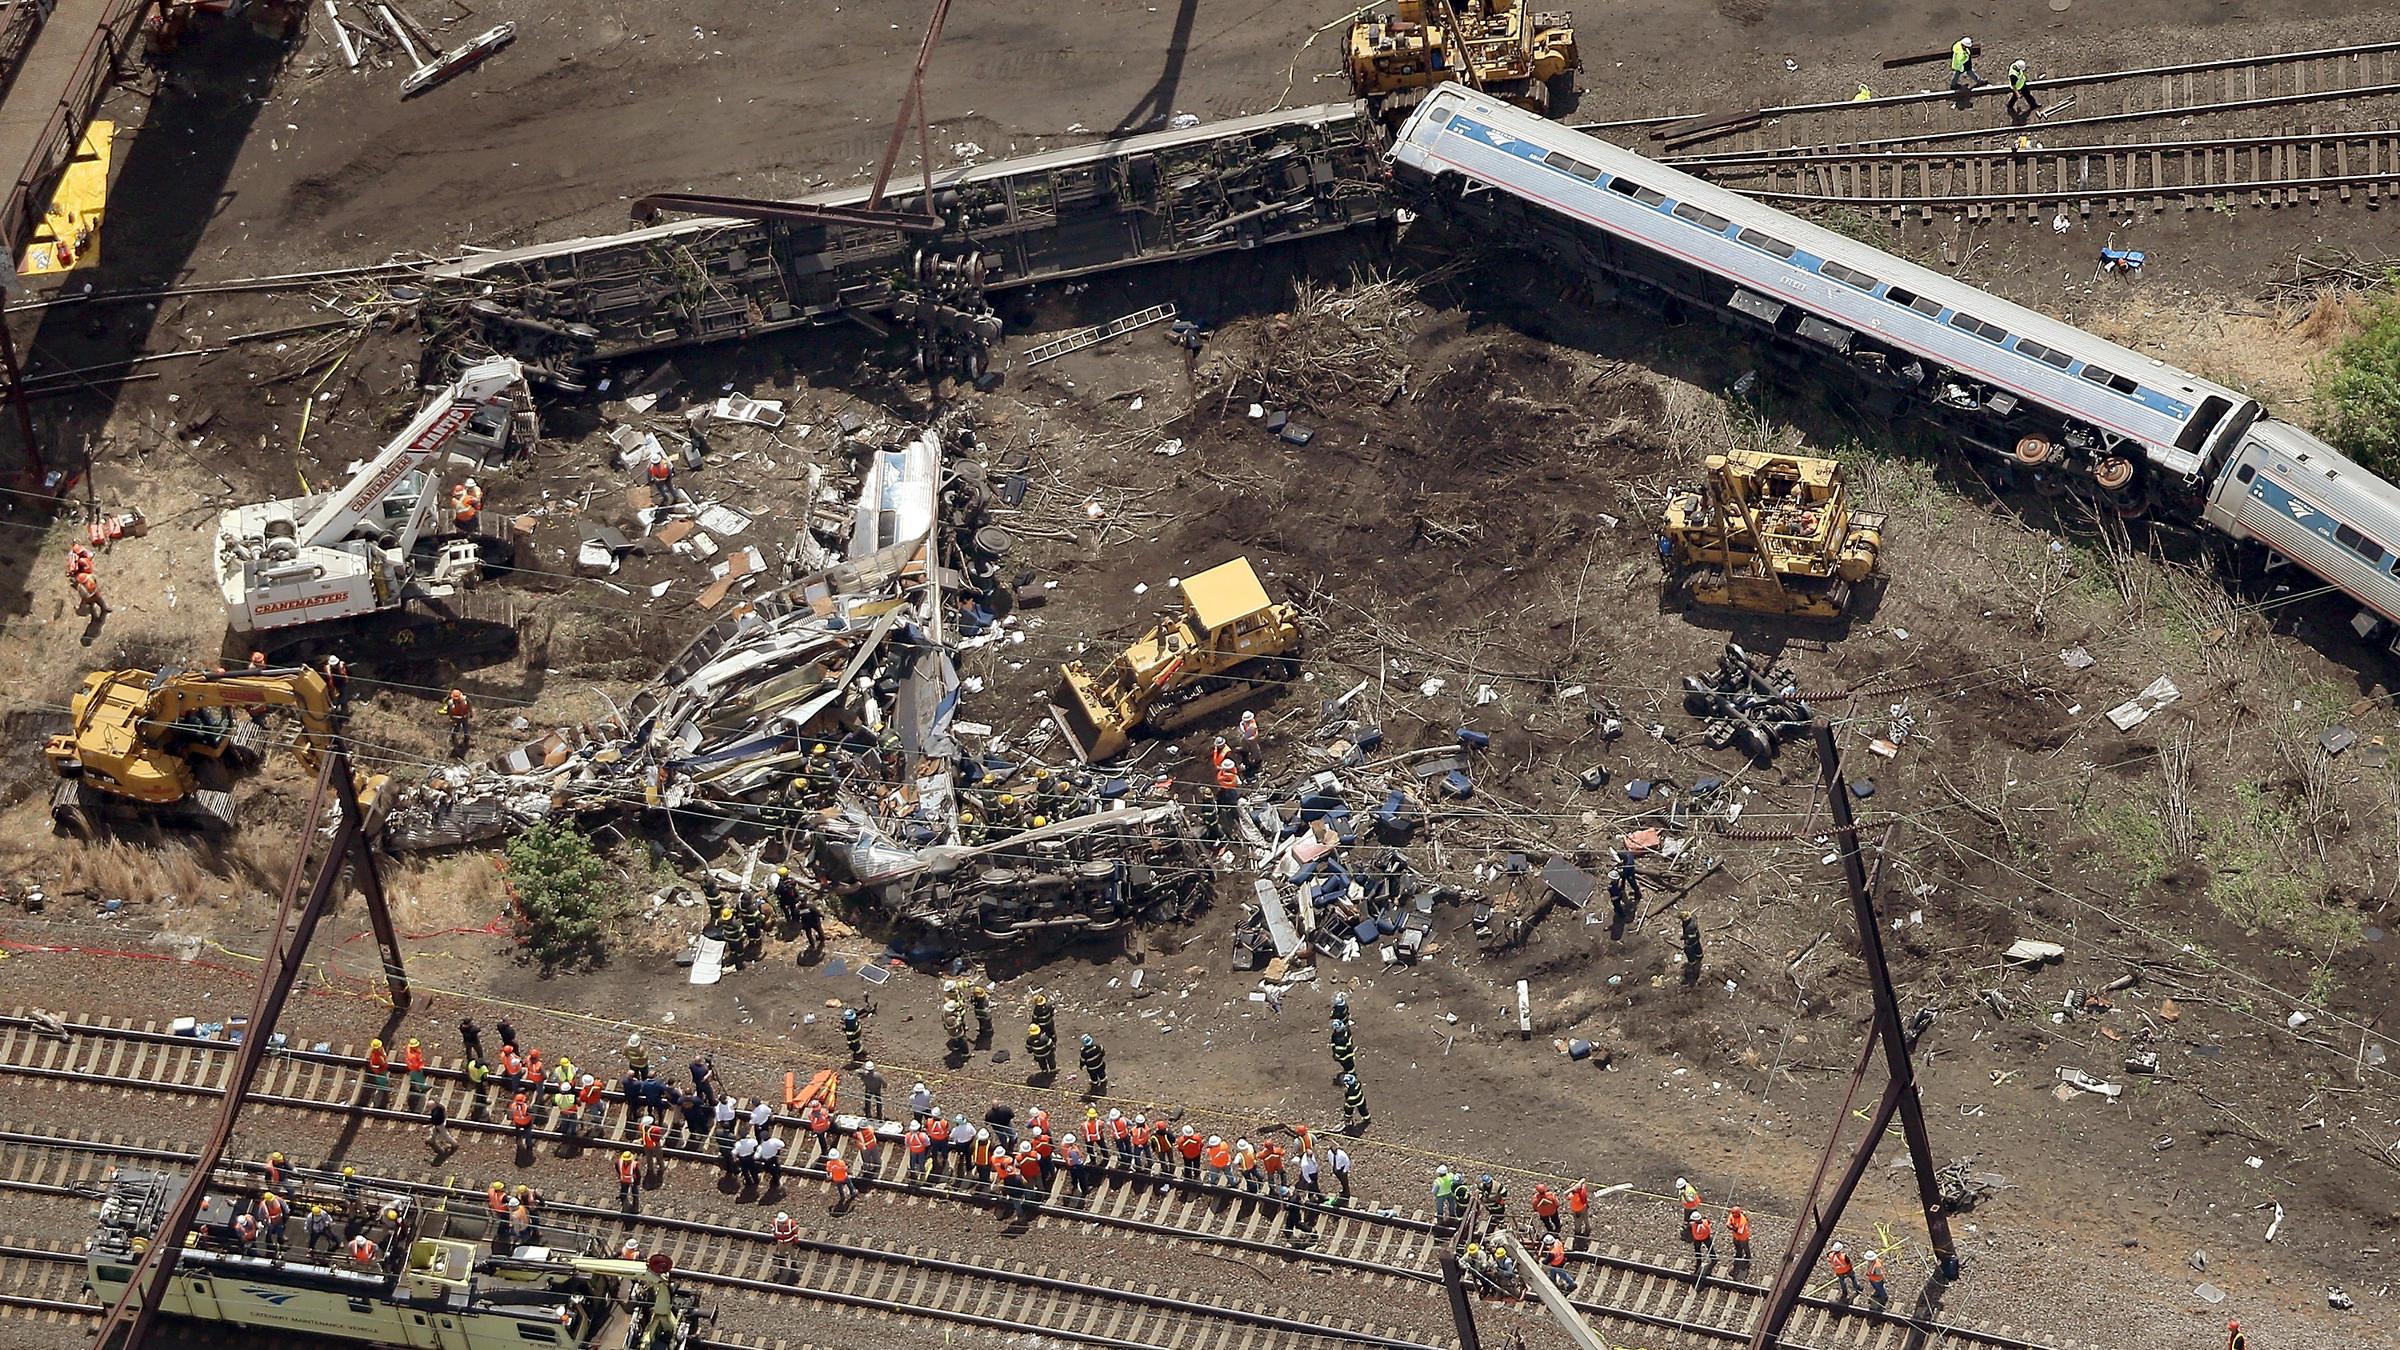 One Year After Fatal Amtrak Derailment, Still Waiting For ...